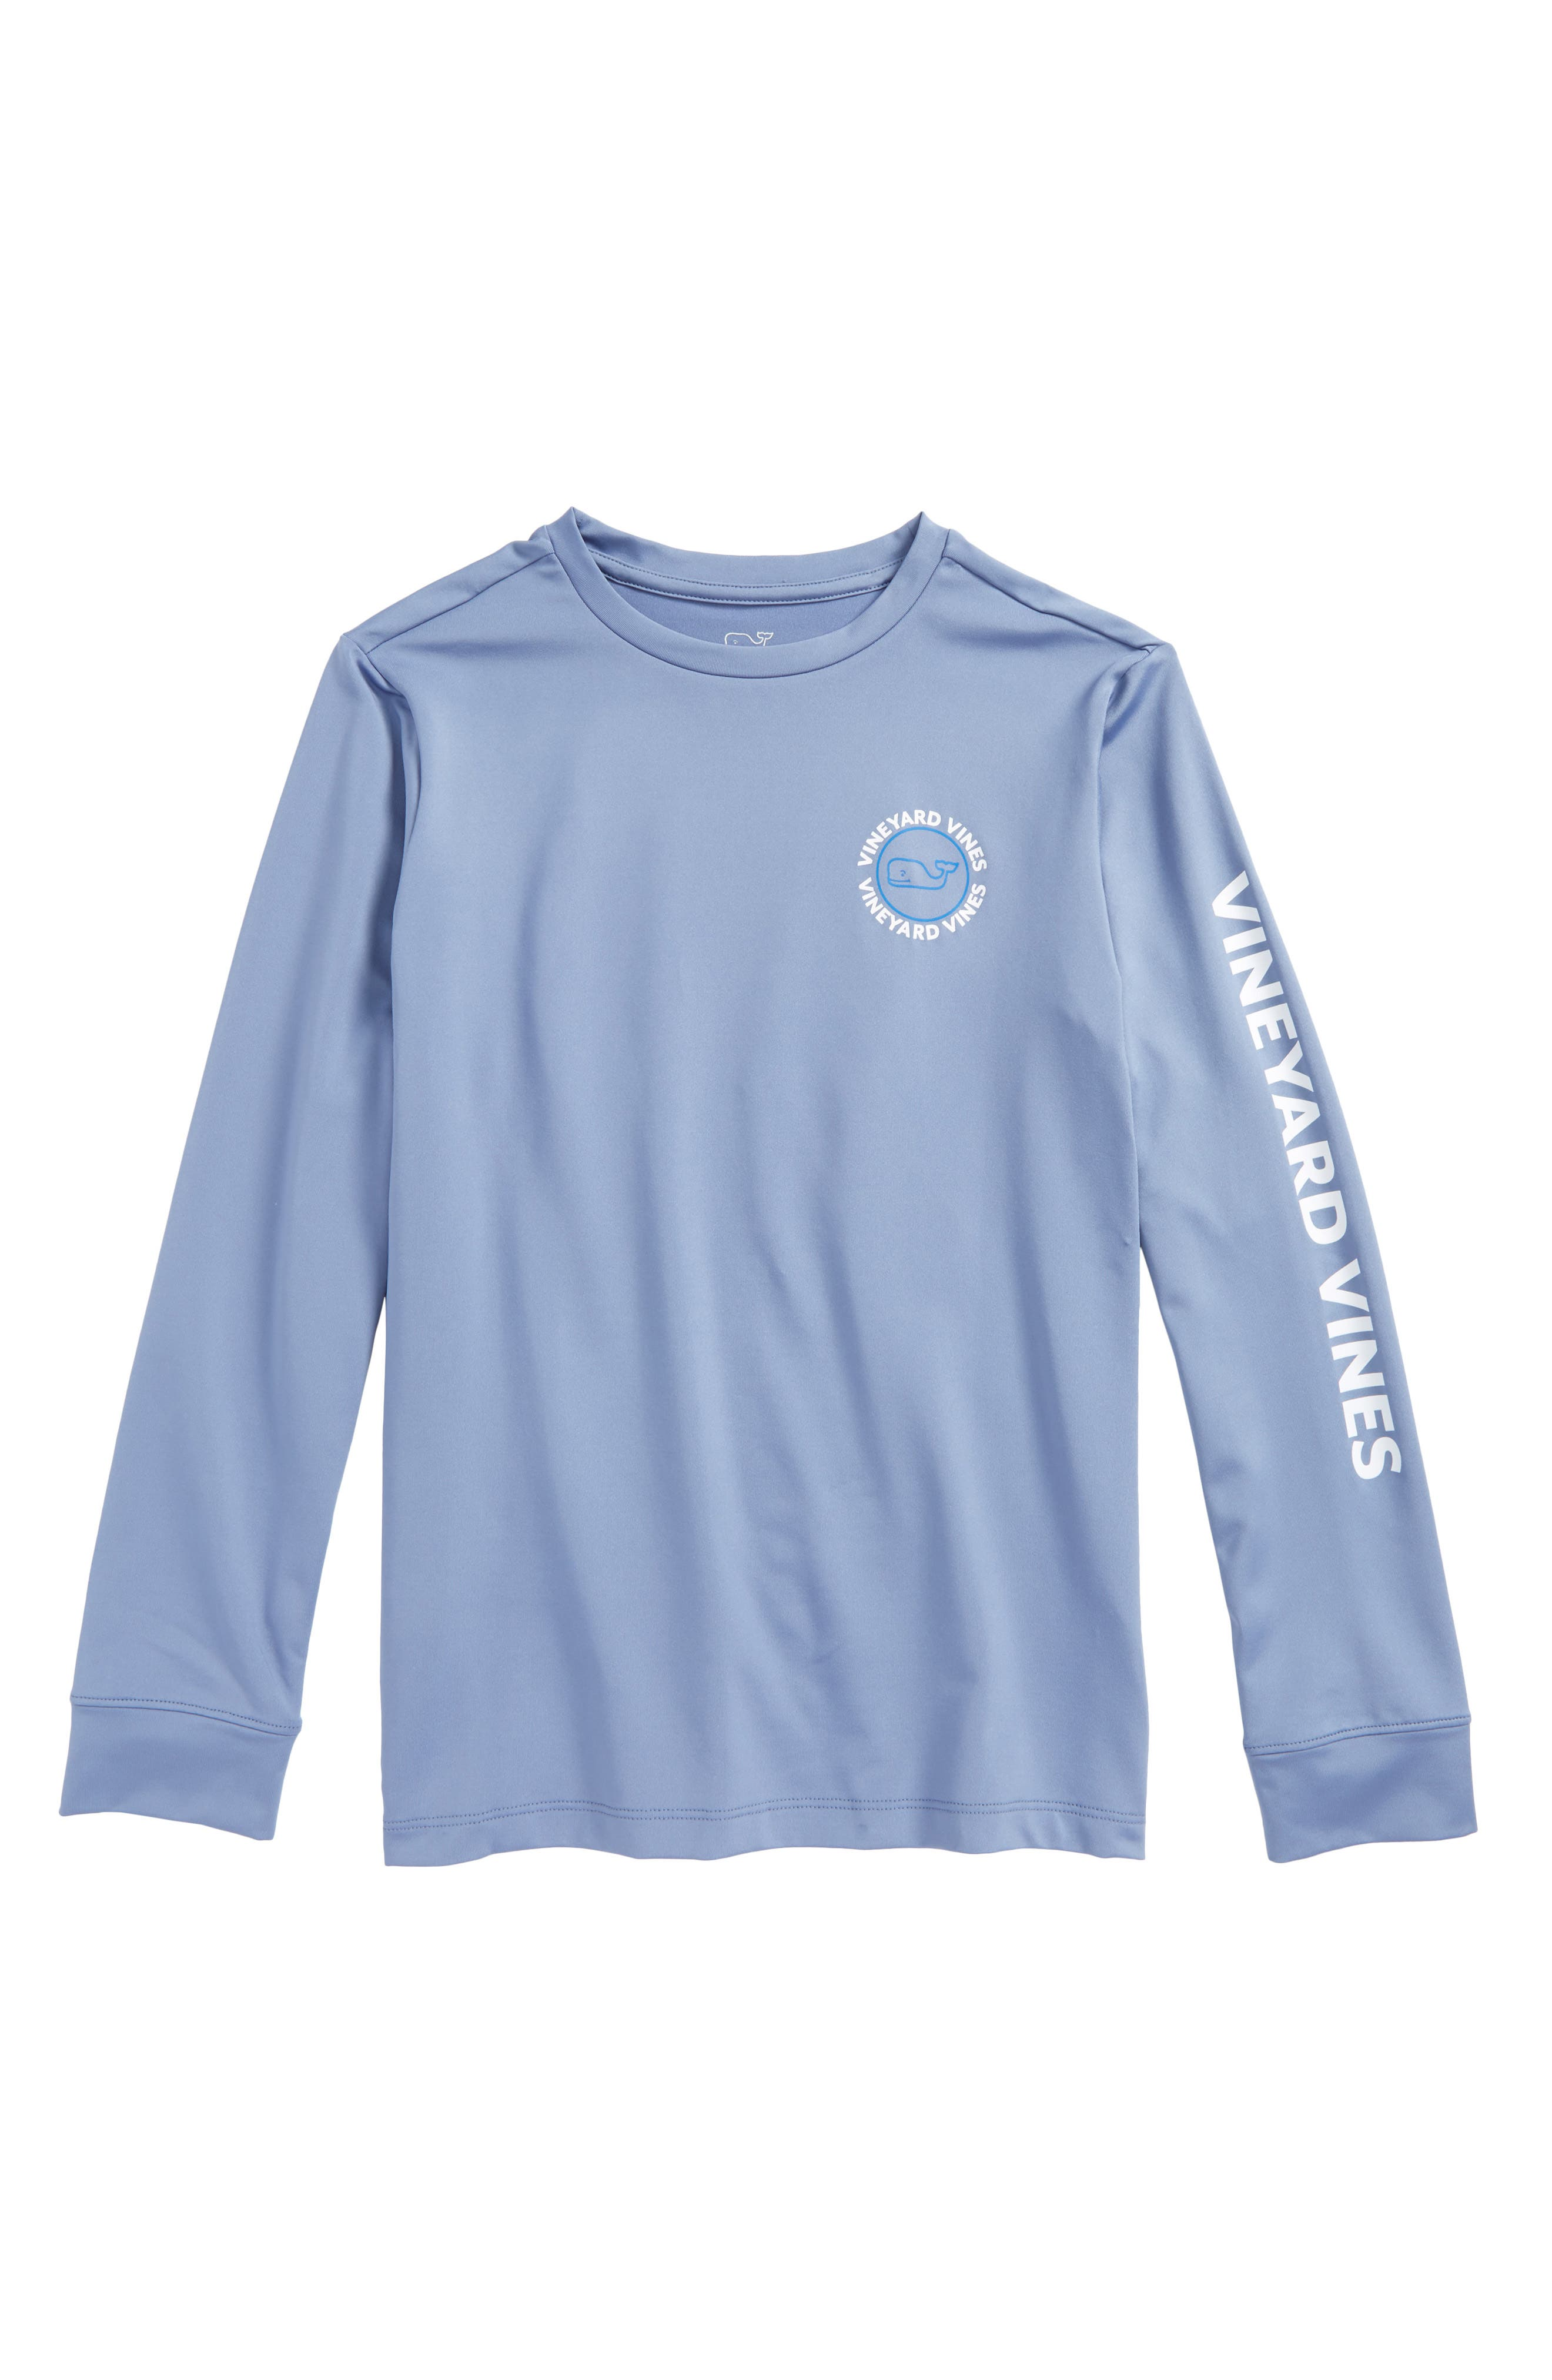 Main Image - vineyard vines Whale Dot Performance T-Shirt (Big Boys)